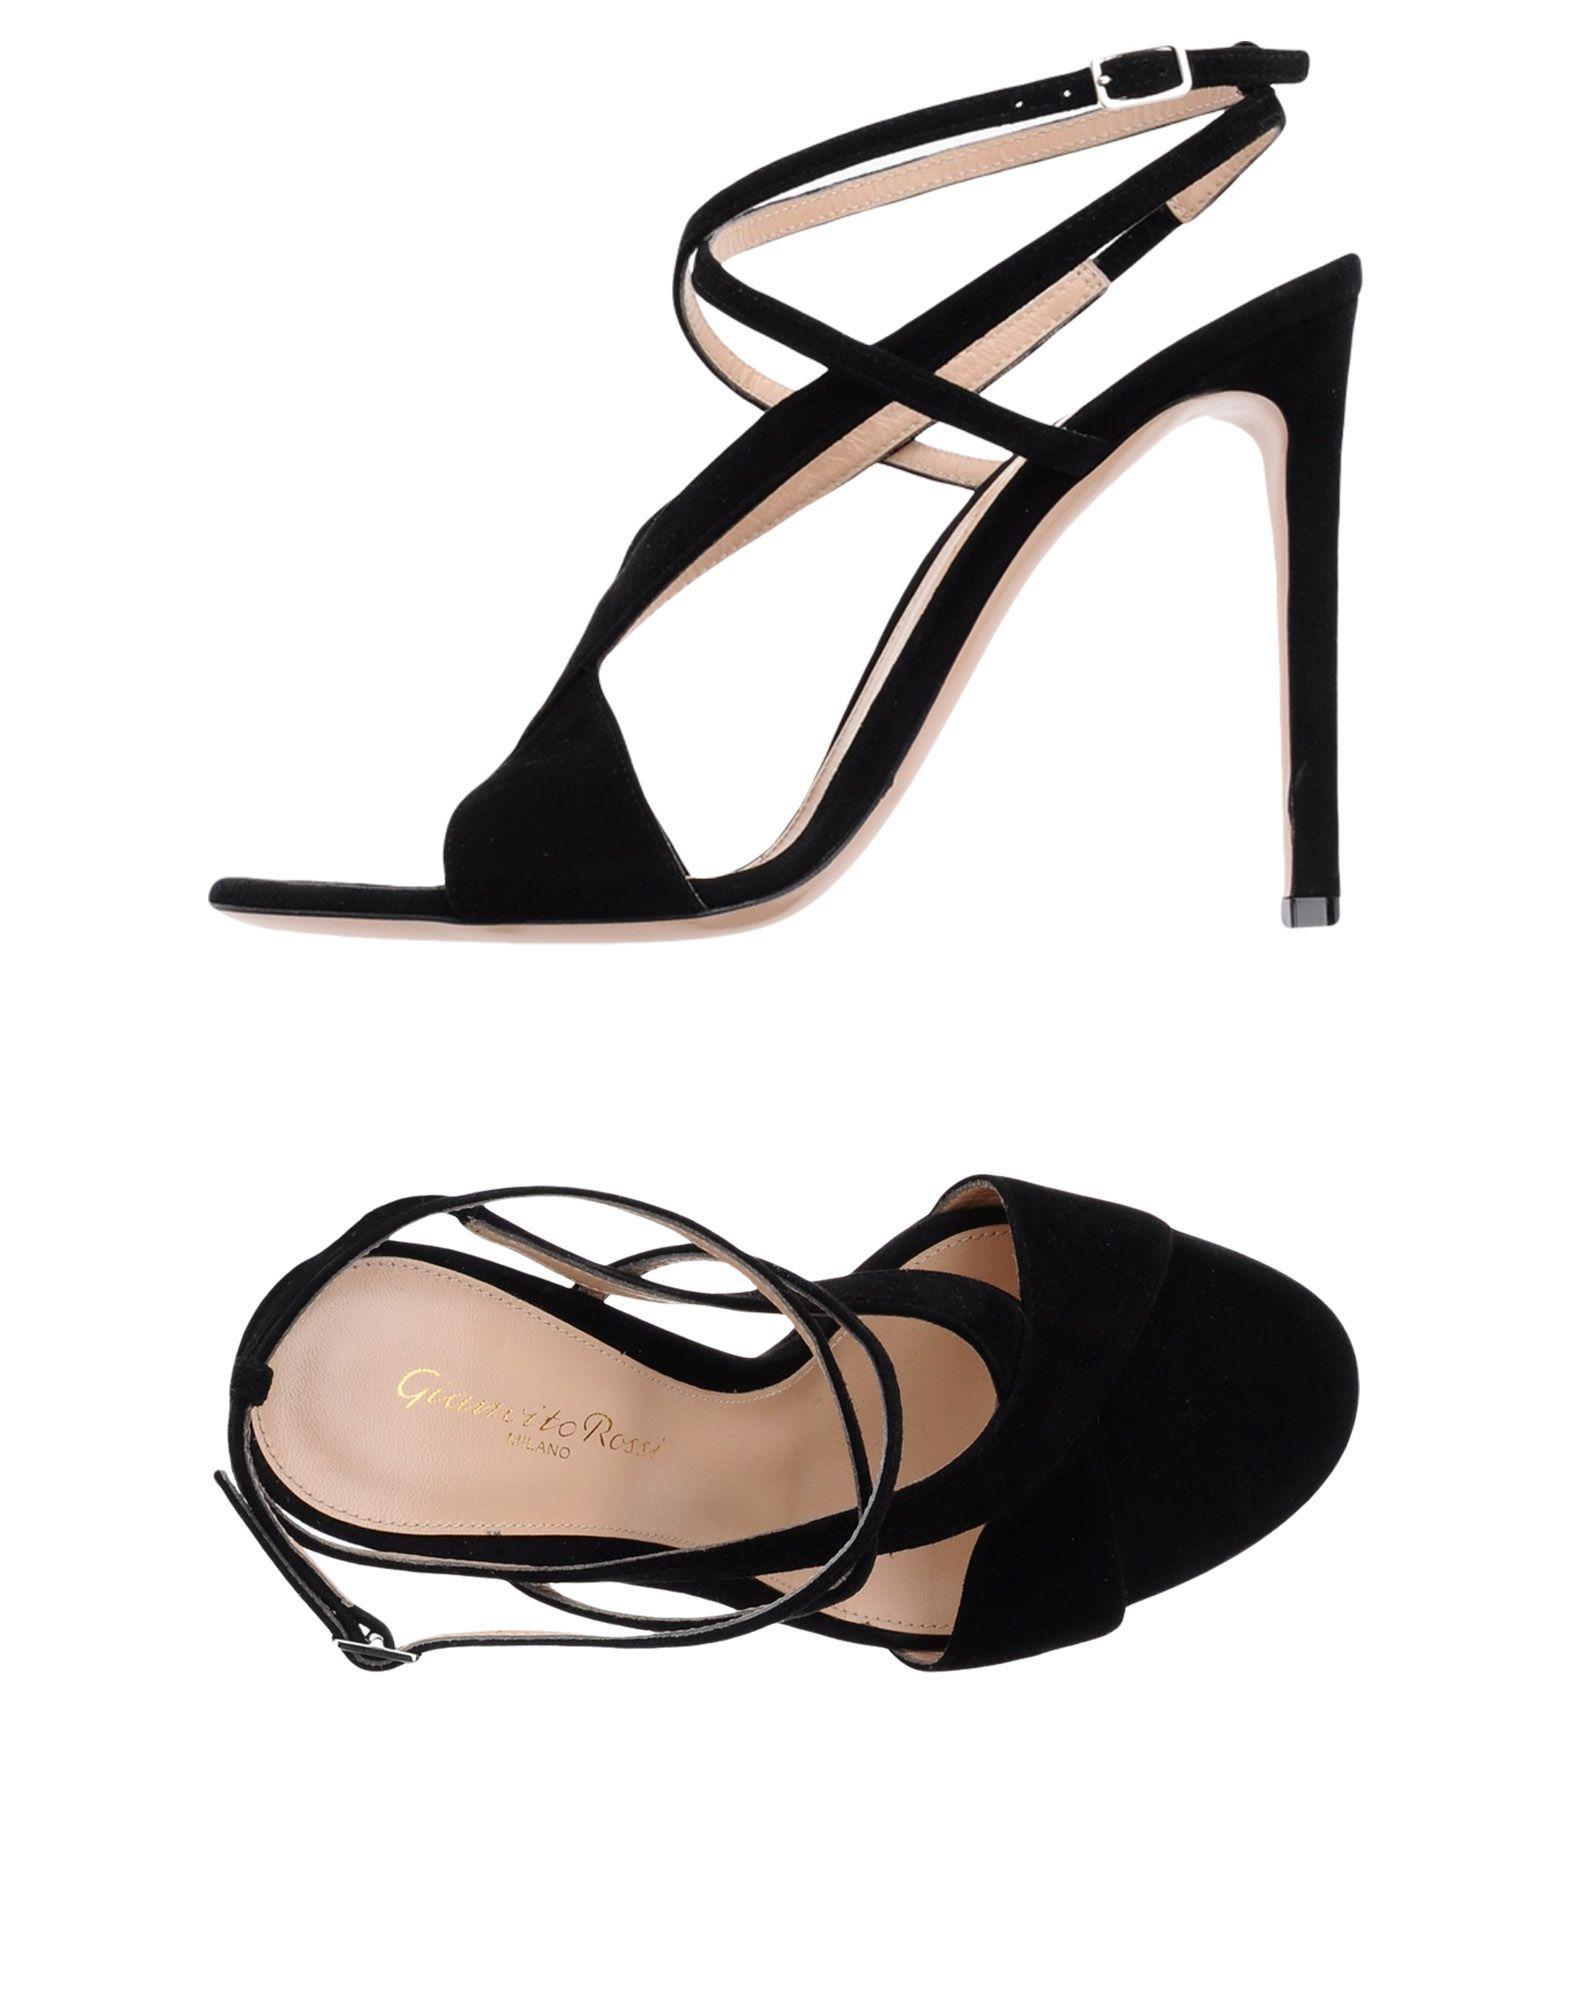 Gianvito Rossi Black Leather Heels